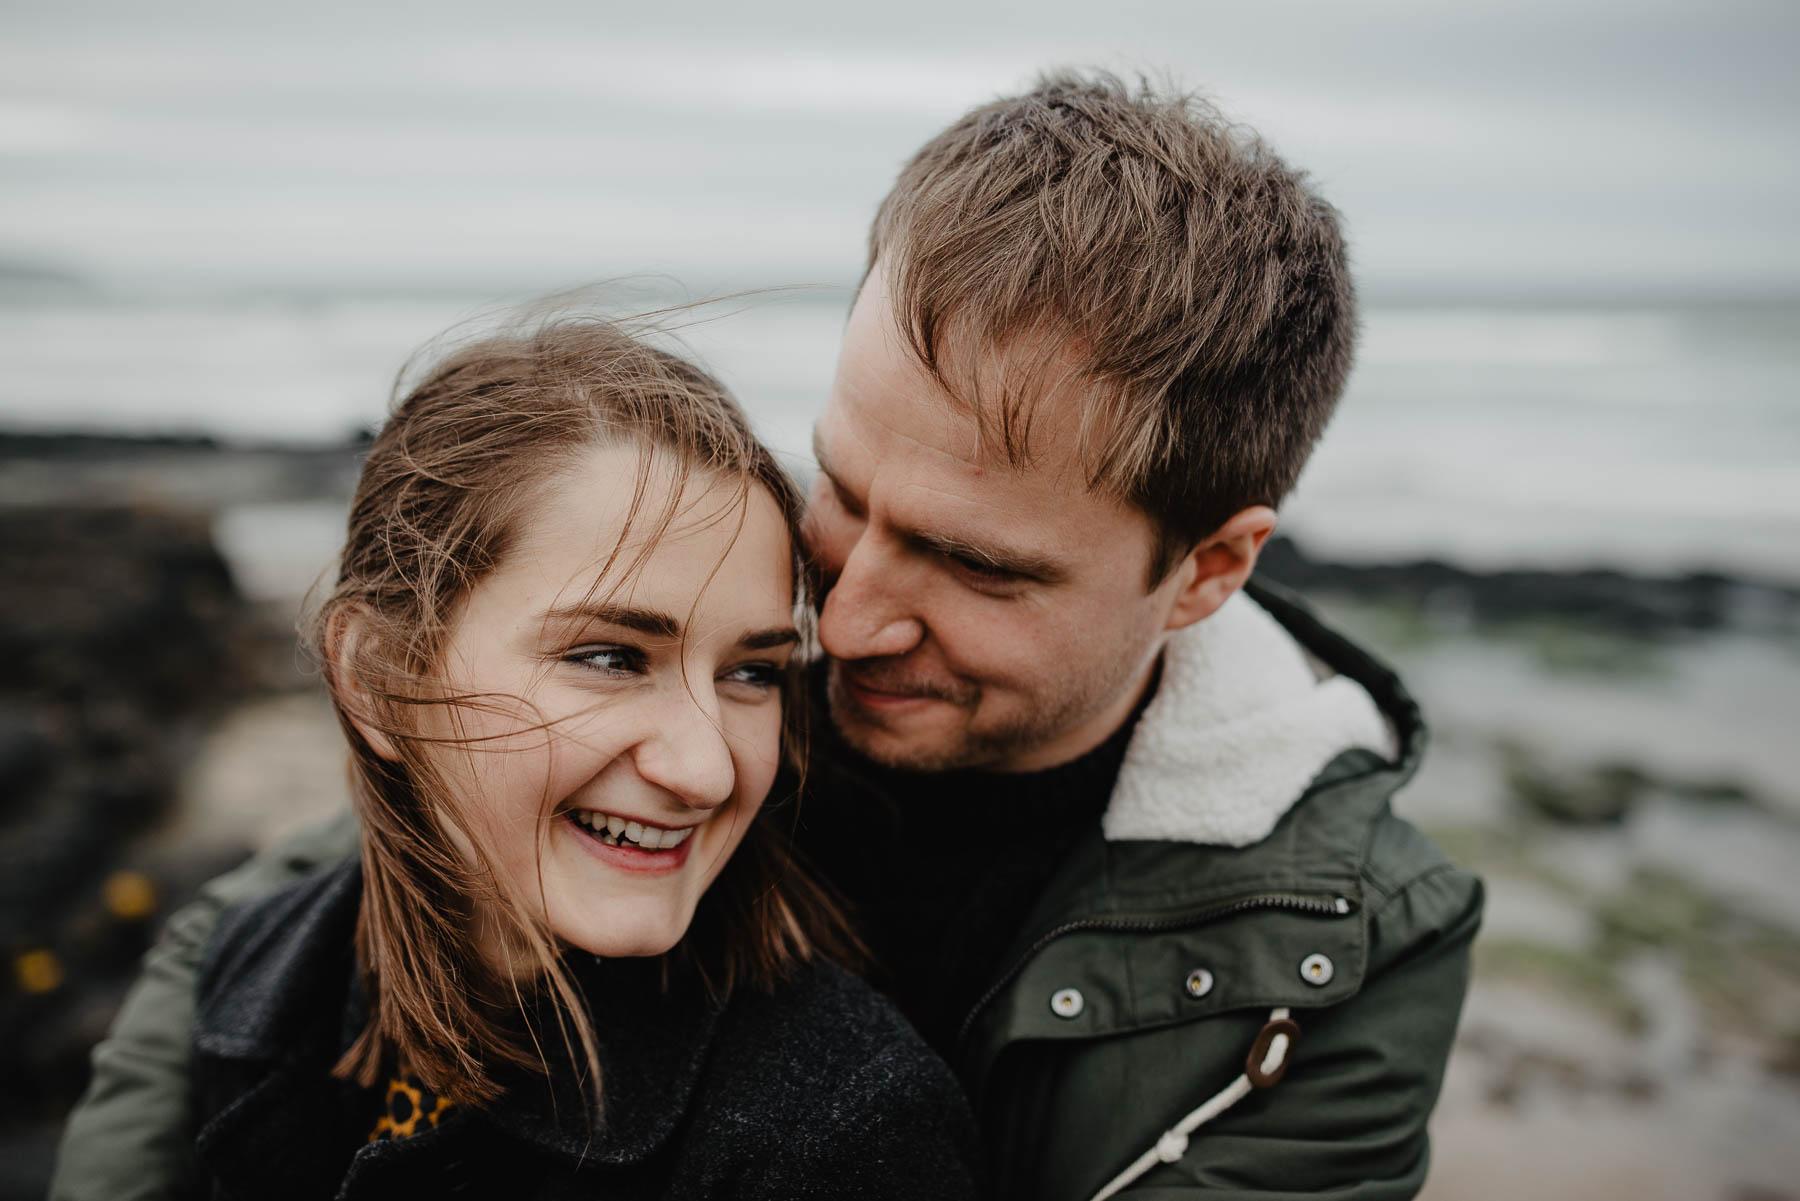 belfast-wedding-engagement-photography-13.jpg